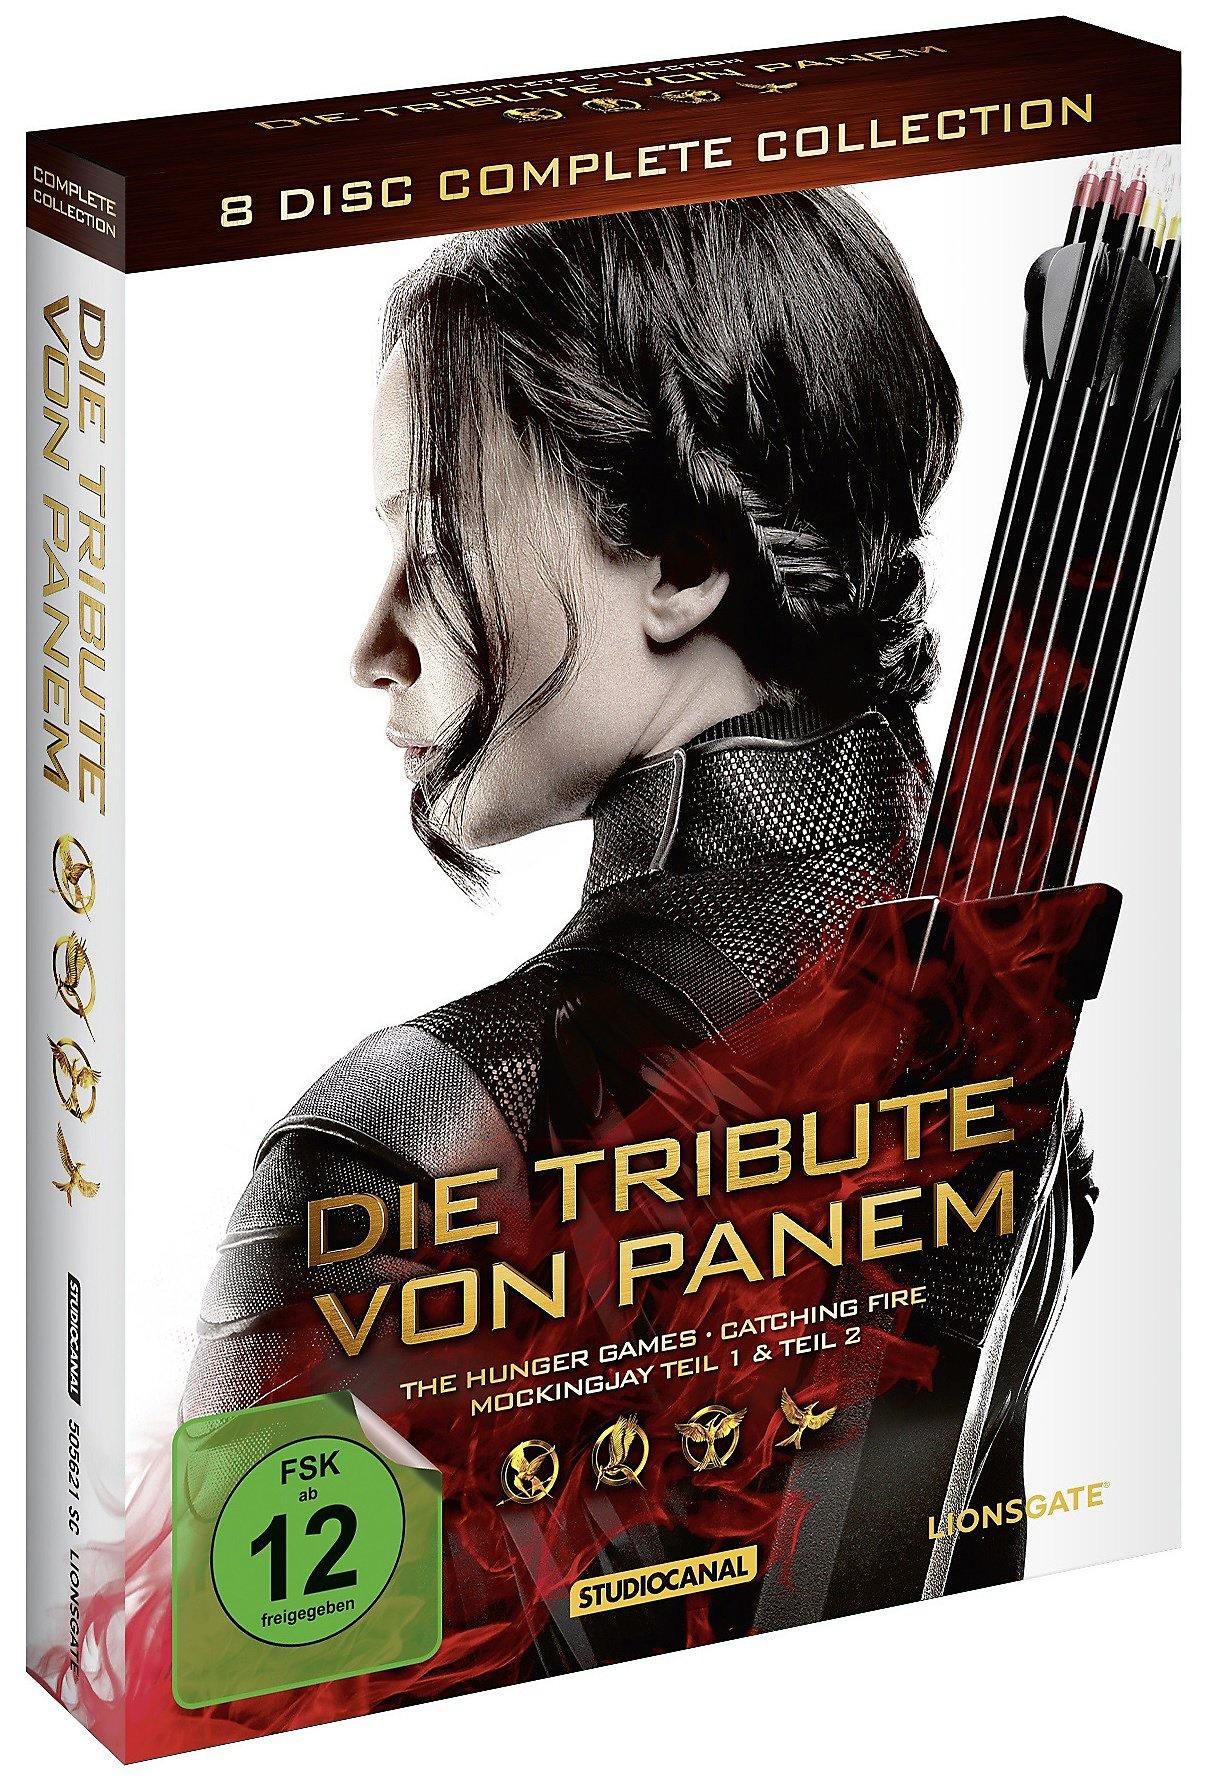 Tribute Von Panem Dvd